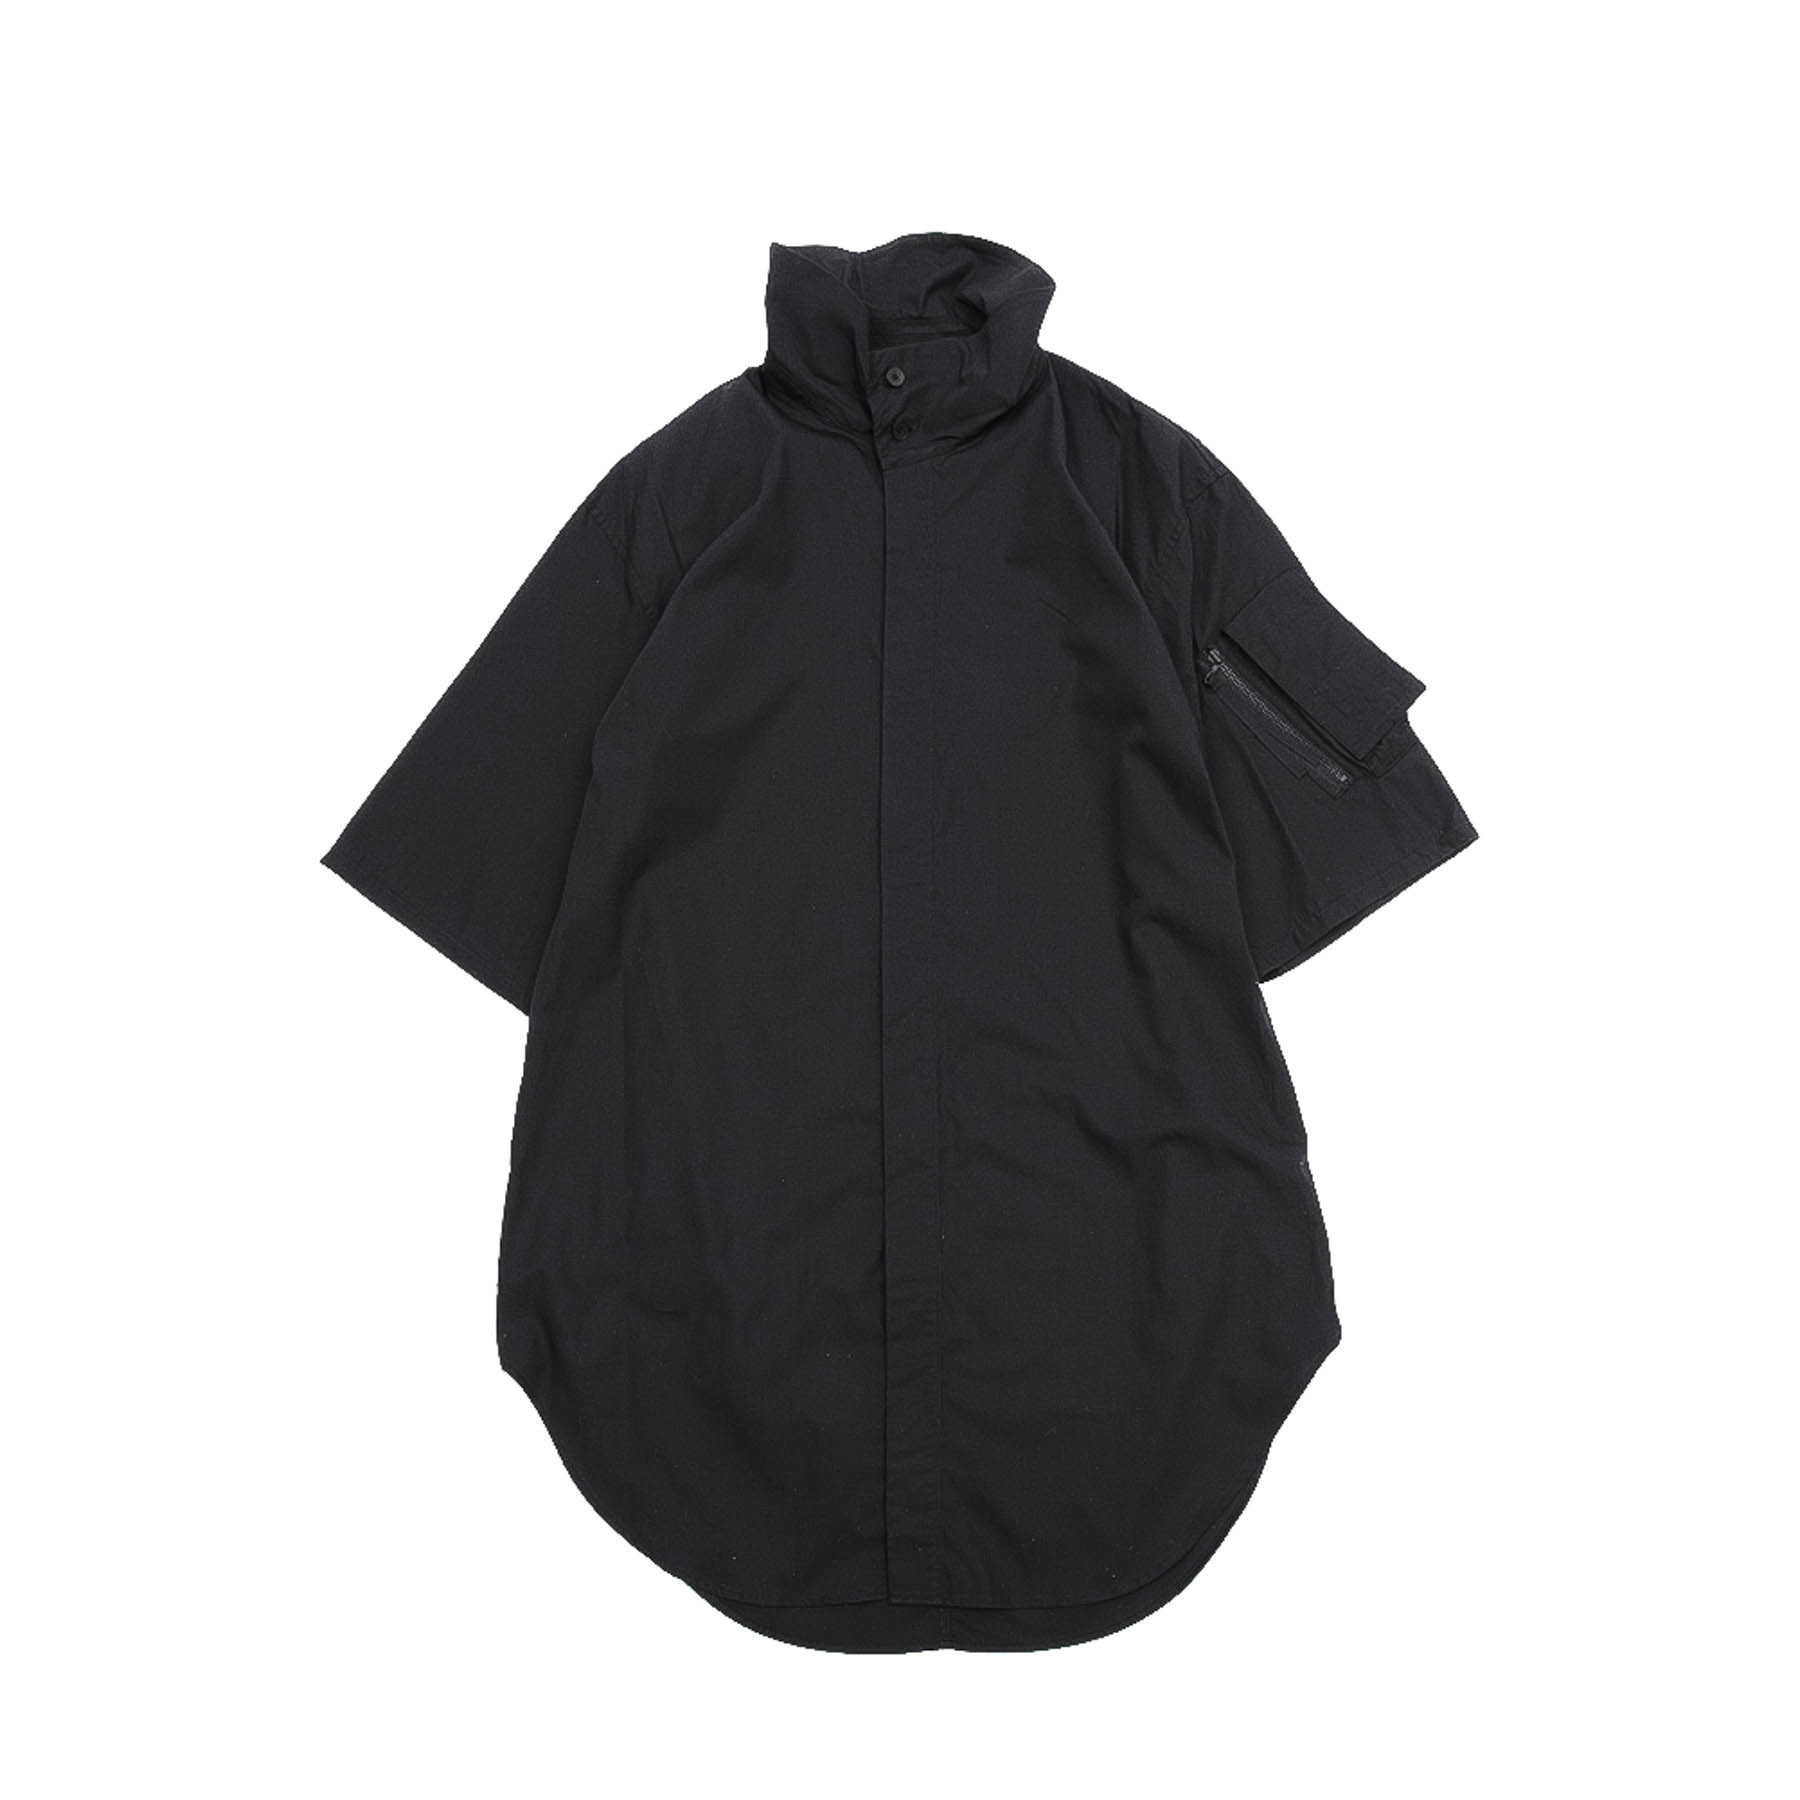 617SHM7-BLACK / タクティカルハイネックシャツ